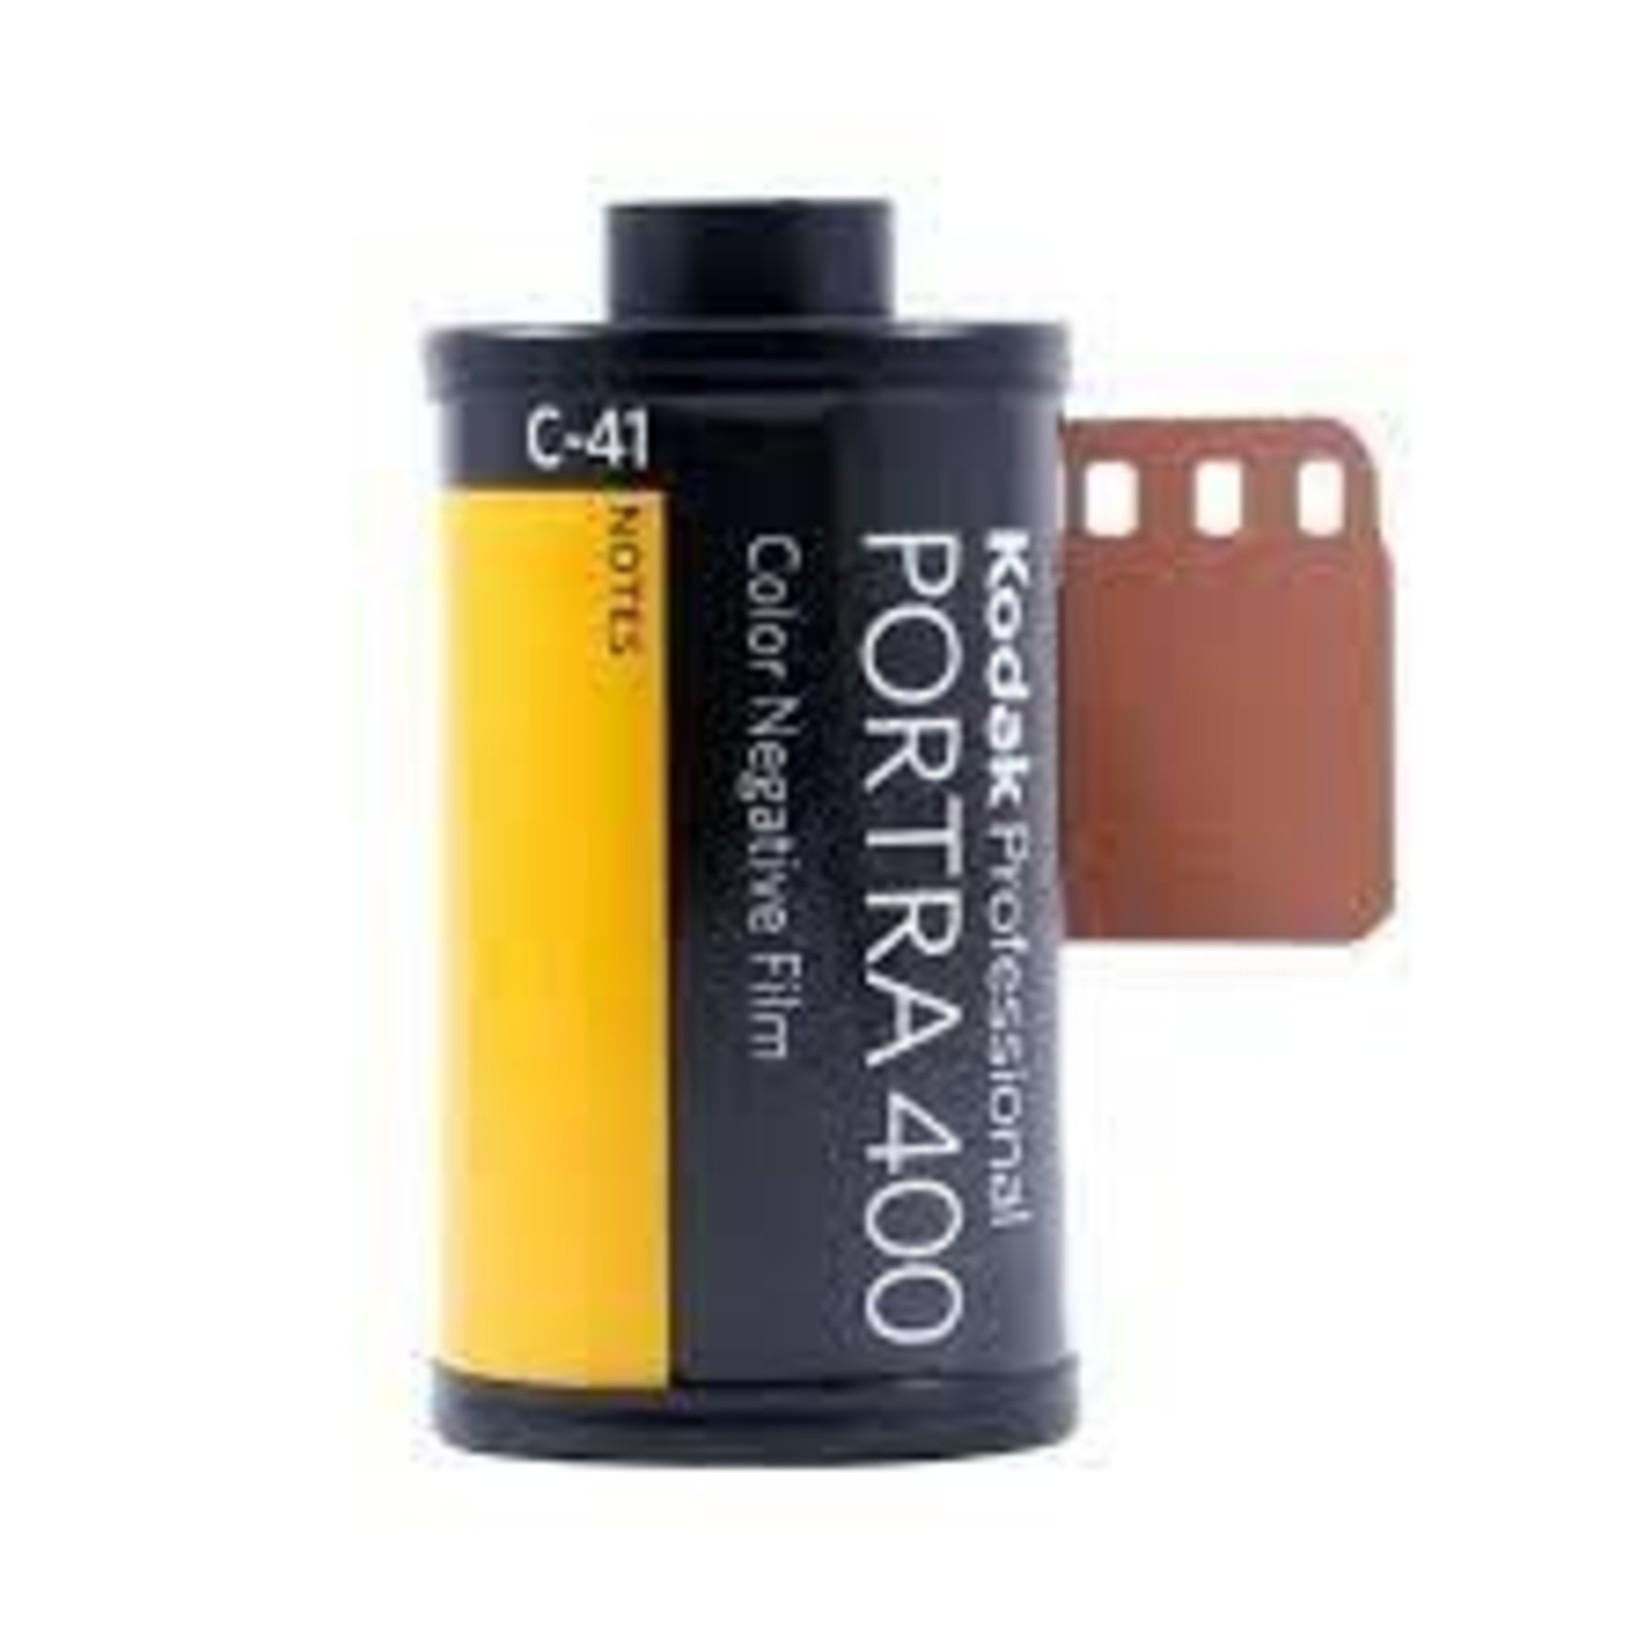 Kodak Kodak Professional Portra 400 Color Negative Film 35mm Roll Film, 36 Exposures